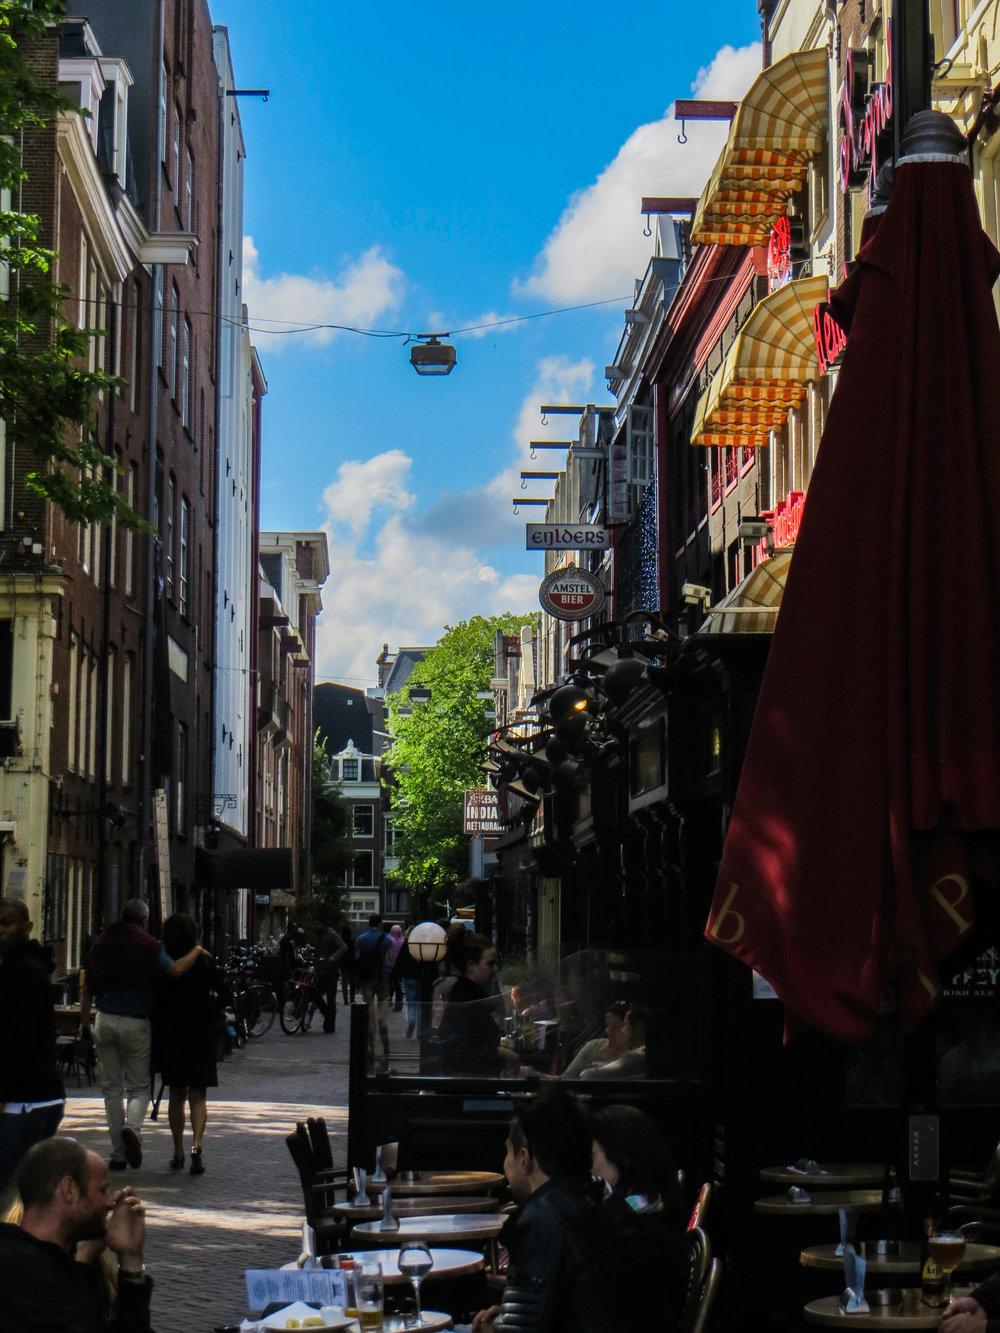 amsterdam-netherlands-street-photography-27.jpg